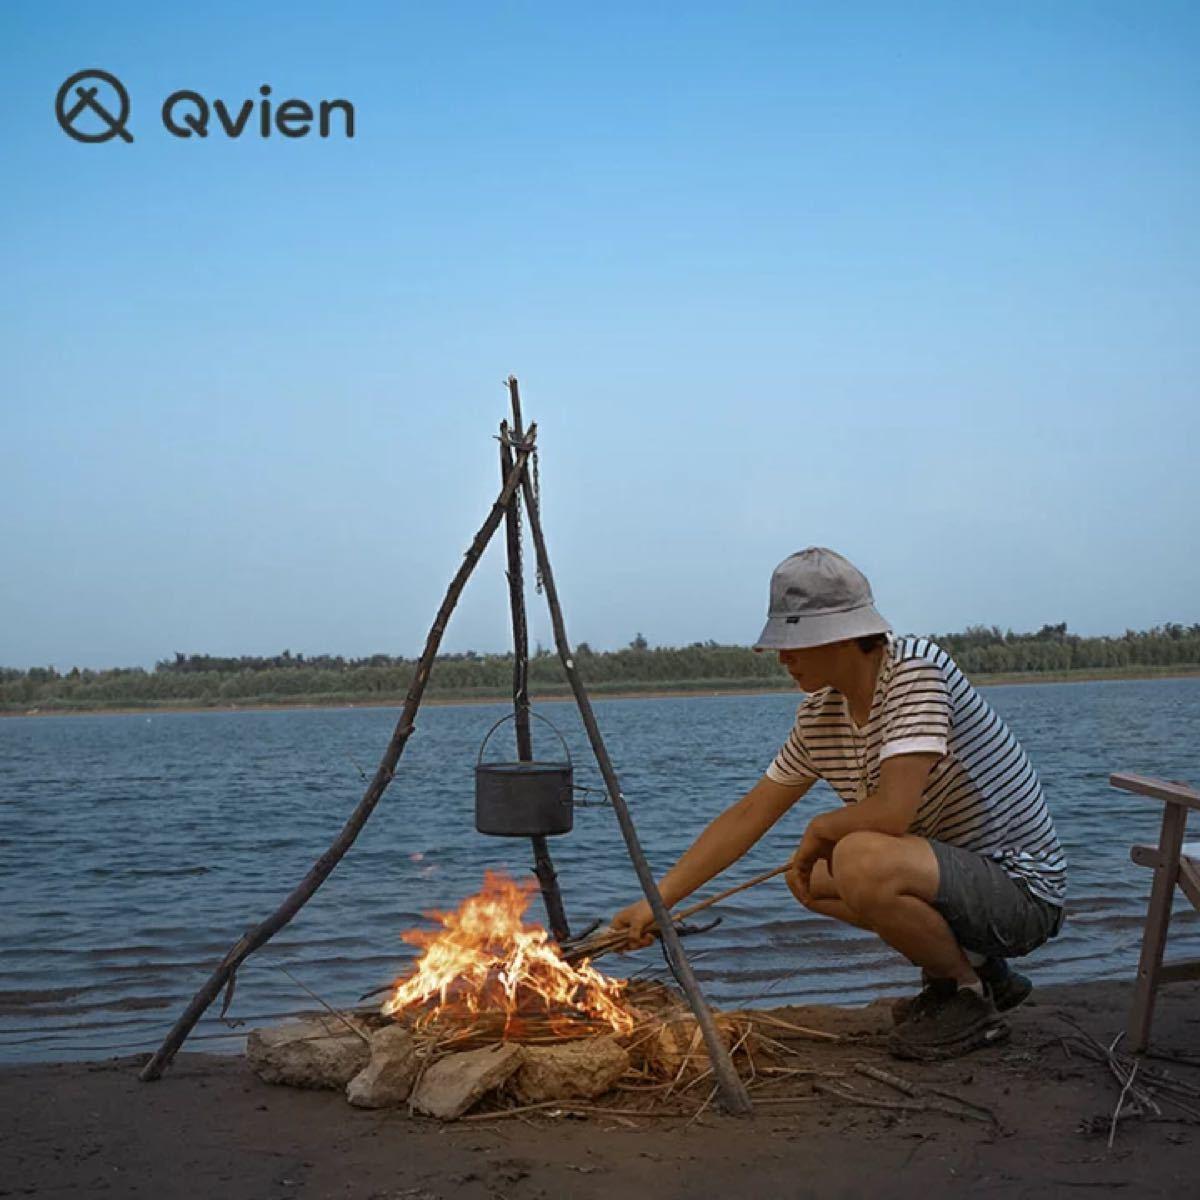 Qvien トライポッド リング ブッシュクラフト キャンプ 用品 アウトドア 焚き火